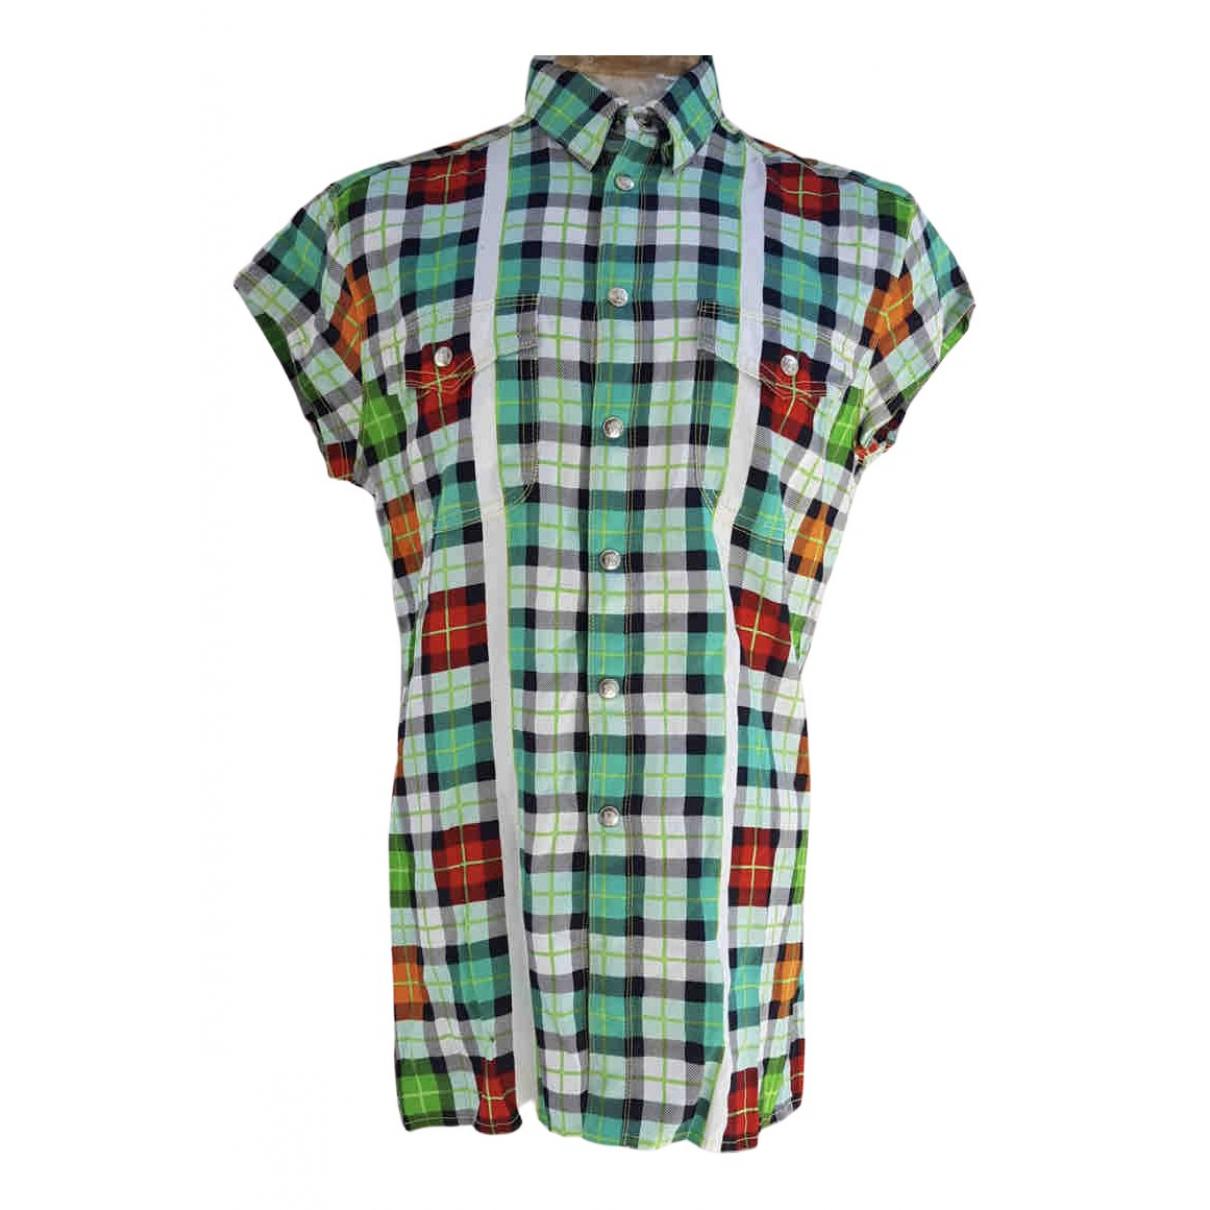 Gianni Versace \N Multicolour Cotton Shirts for Men L International